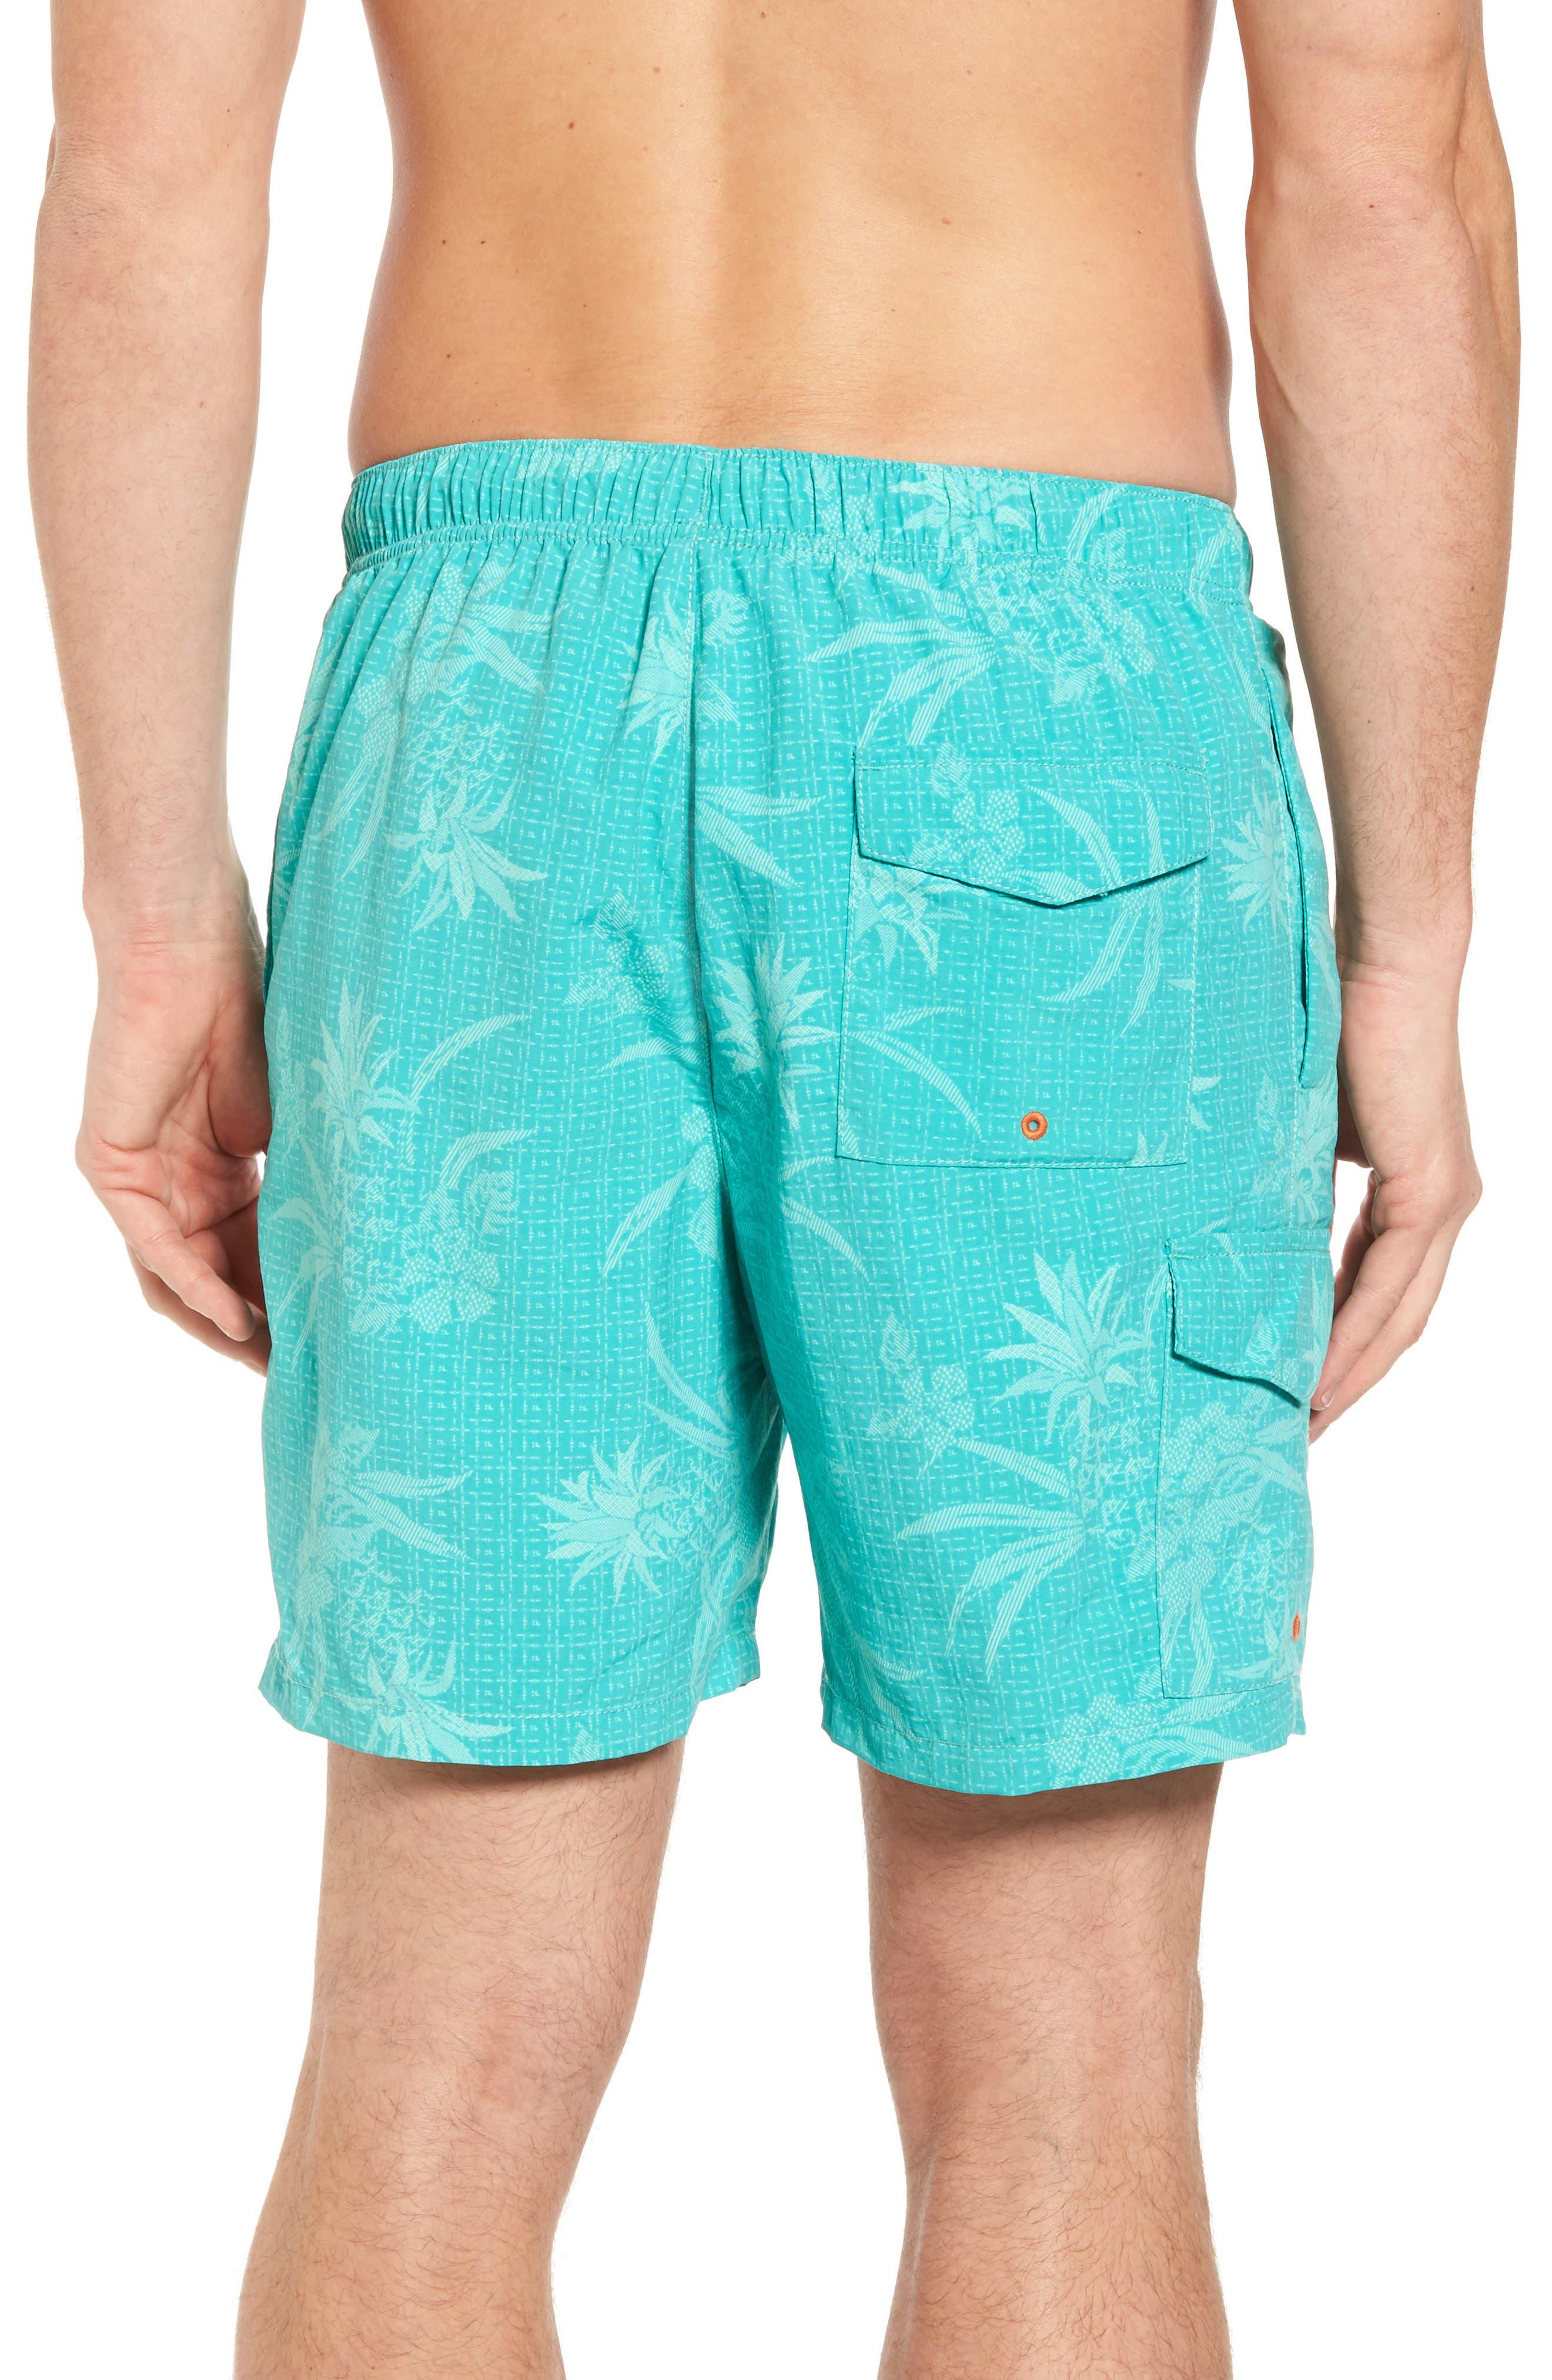 Naples Huli Pineapple Swim Trunks,                             Alternate thumbnail 2, color,                             Castaway Green